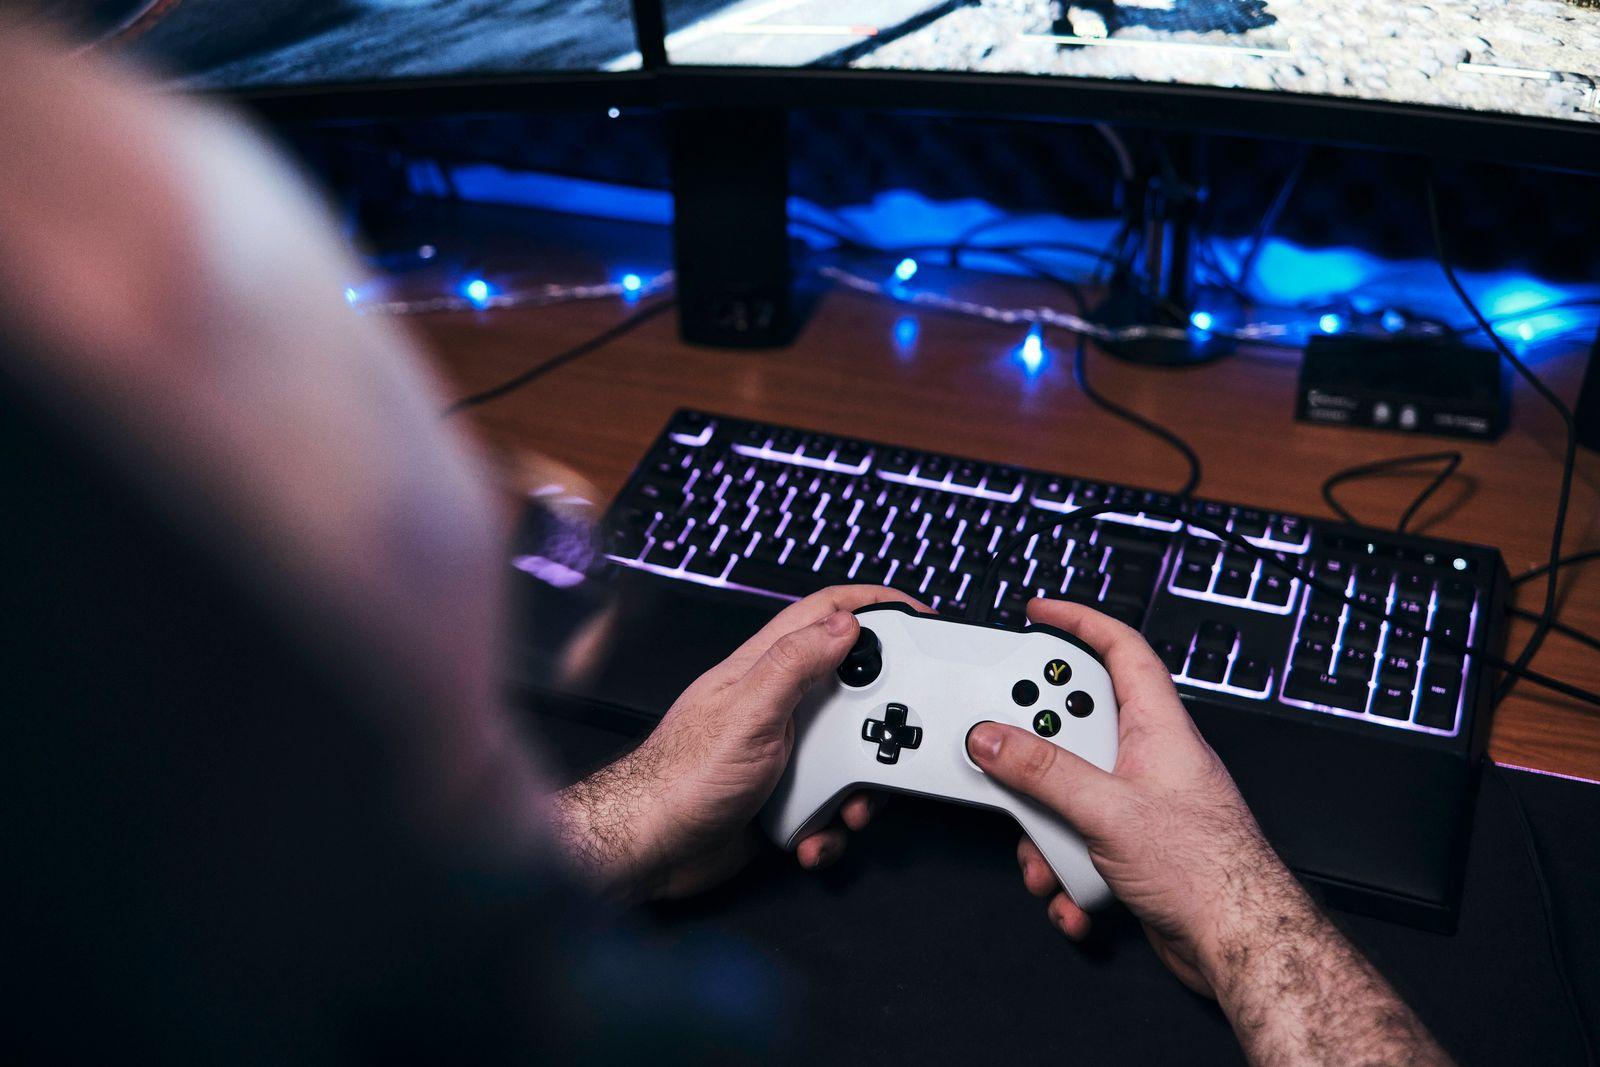 Gamer holding Gamepad, Controller Console in hands. Close up. Las Palmas de Gran Canaria, CN, Spain PUBLICATIONxINxGERxS